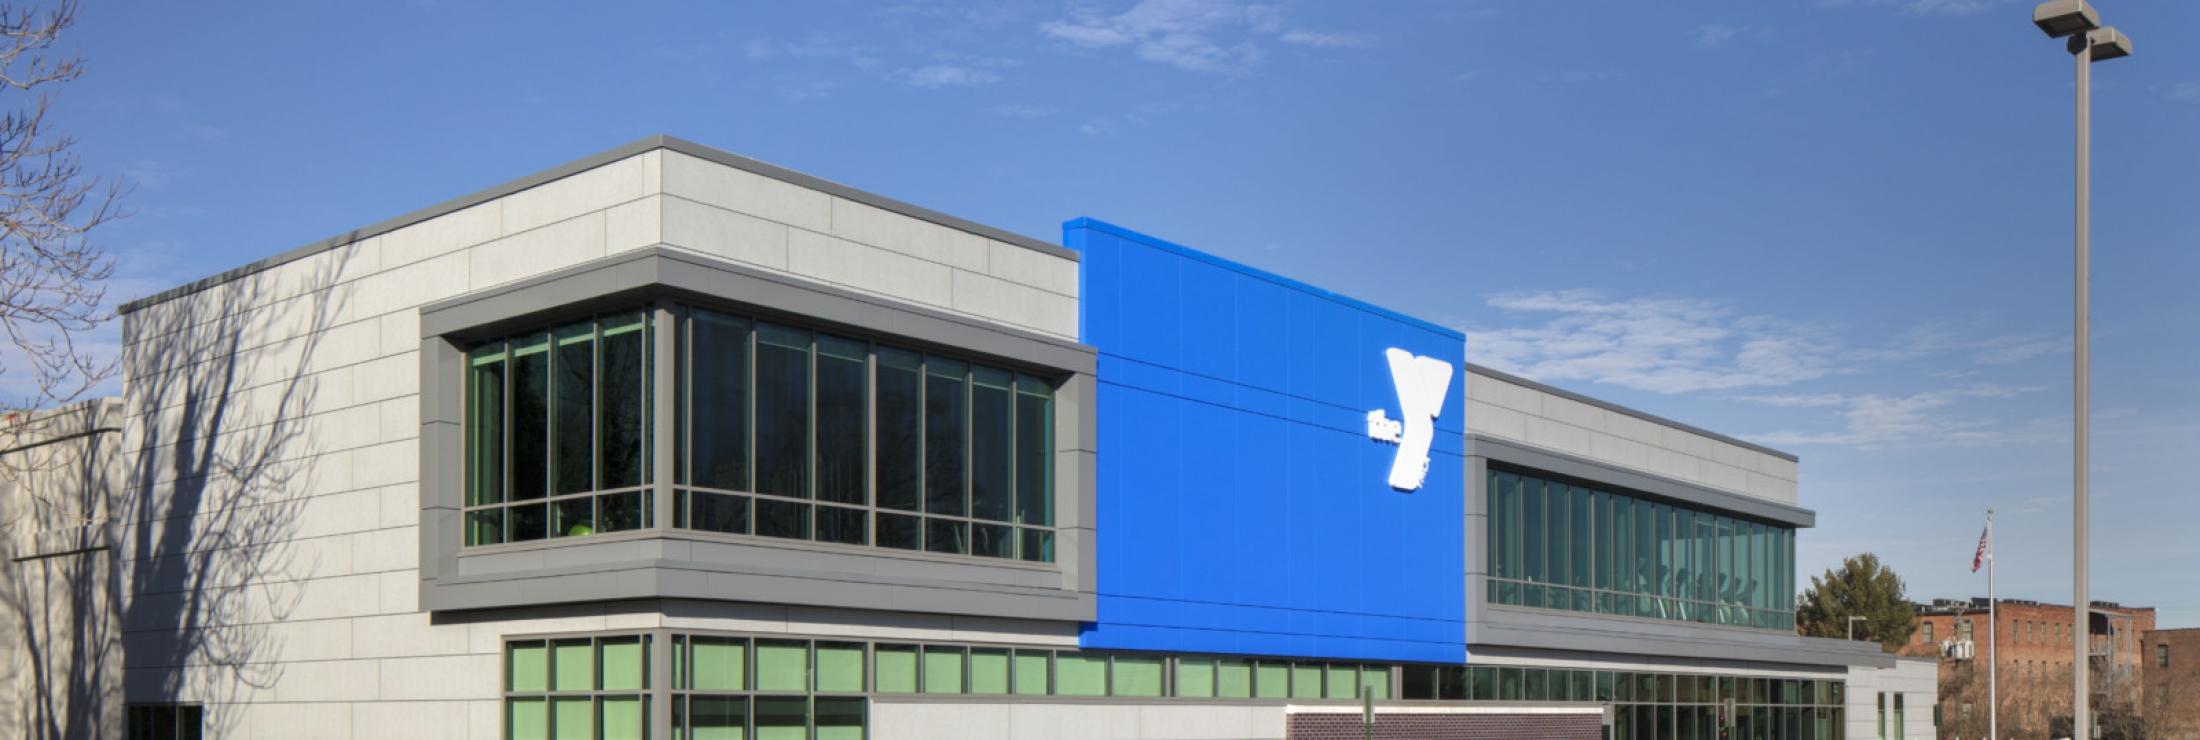 Cladding Corp - Petersburg YMCA - Swisspearl